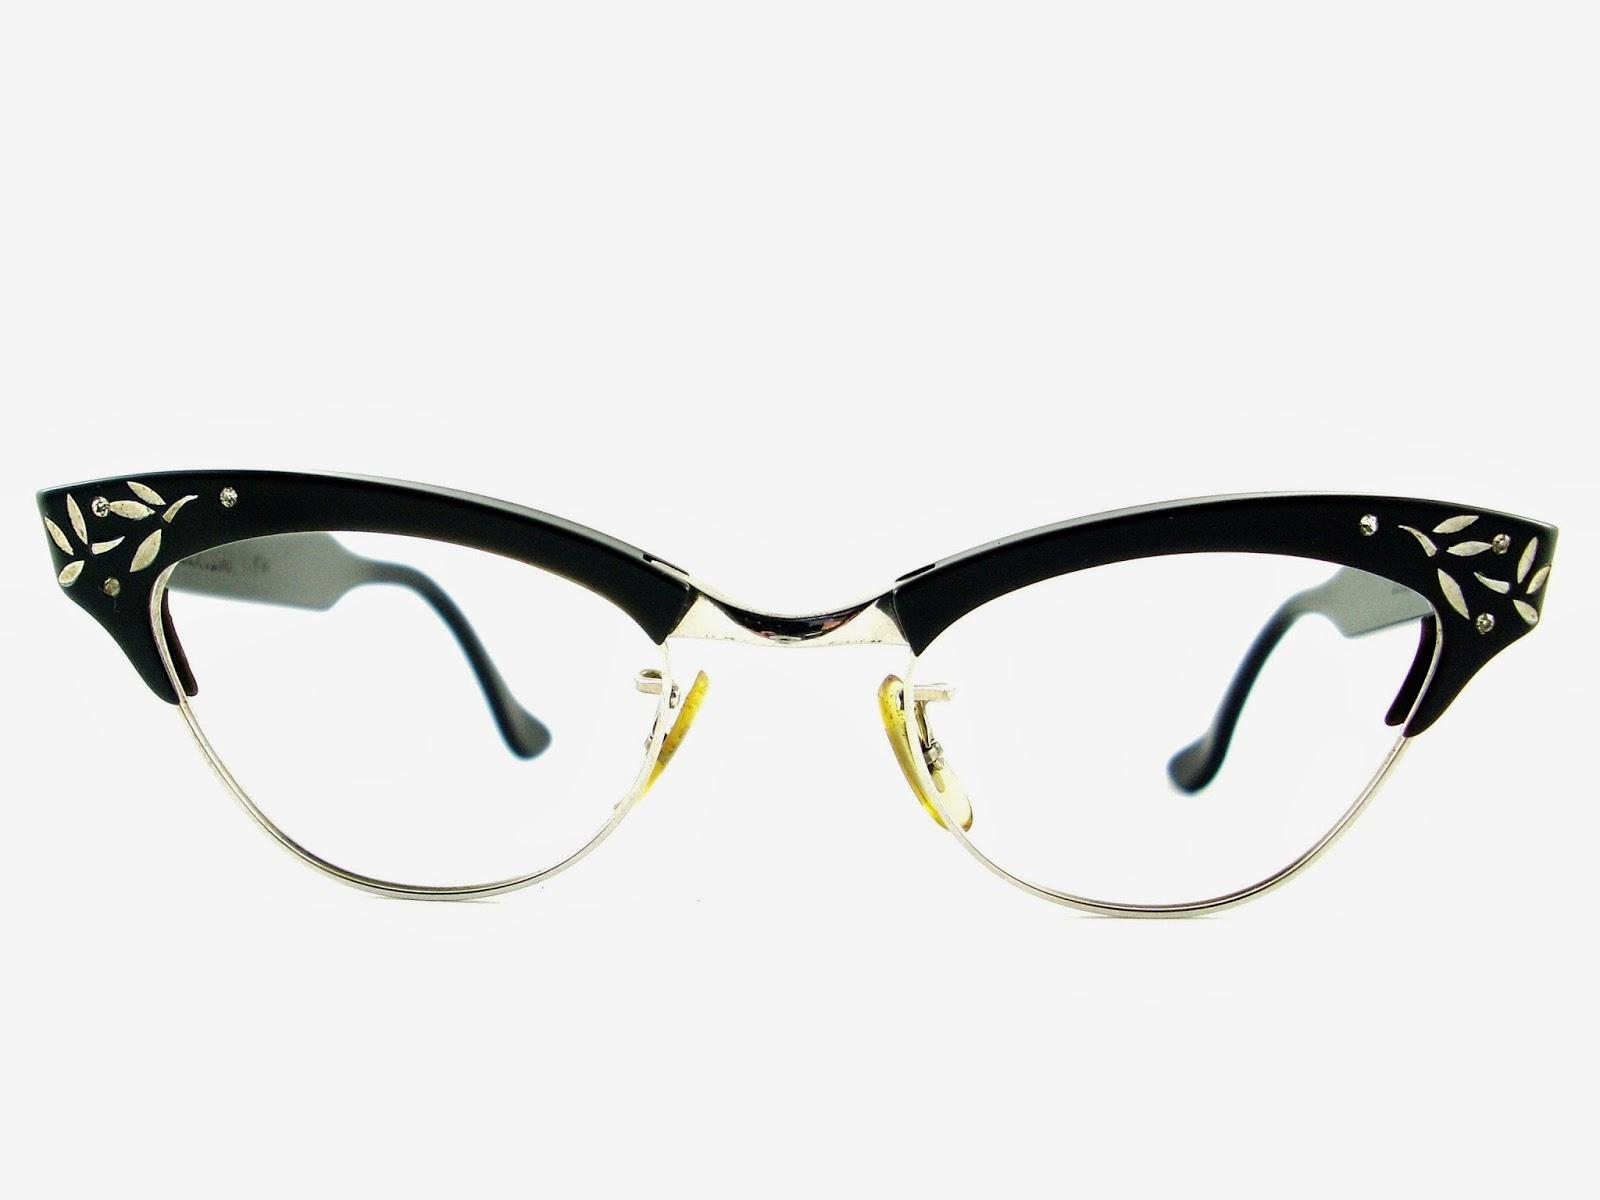 c88a227301347 Vintage Eyeglasses Frames Eyewear Sunglasses 50S  Vintage Cat Eye ...